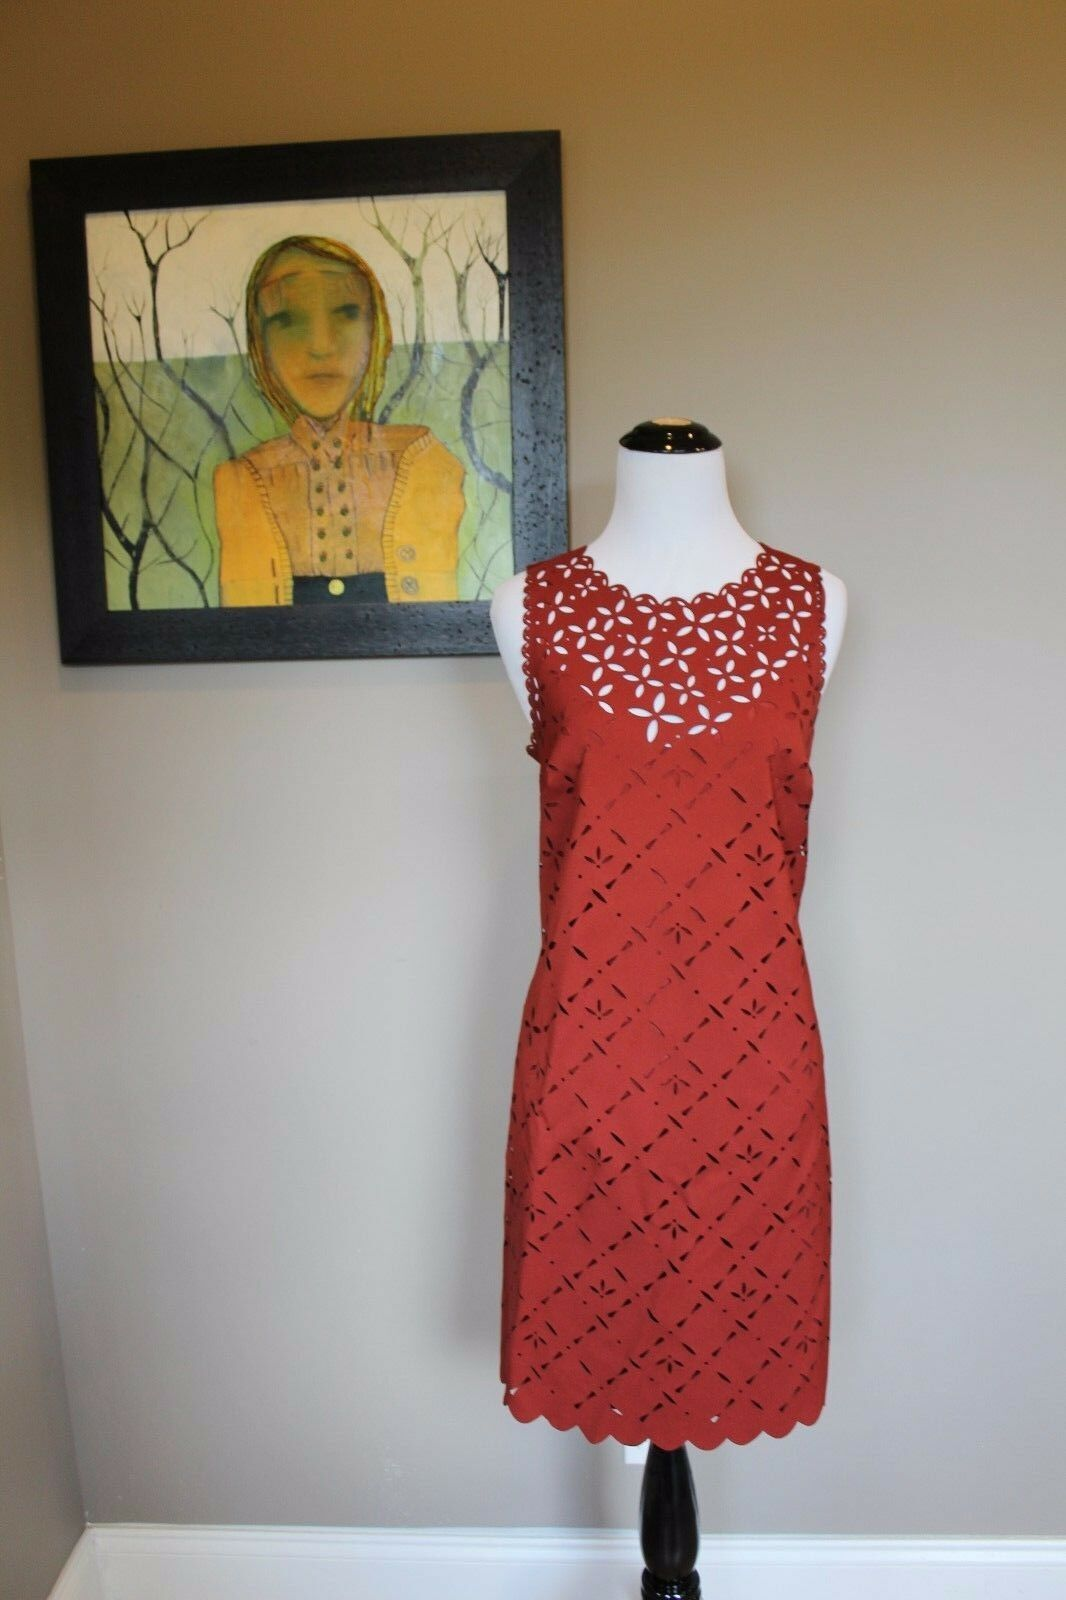 NWT J Crew Lace Cut Floral Shift Dress in Dark Cognac Sz 8 Medium B8789